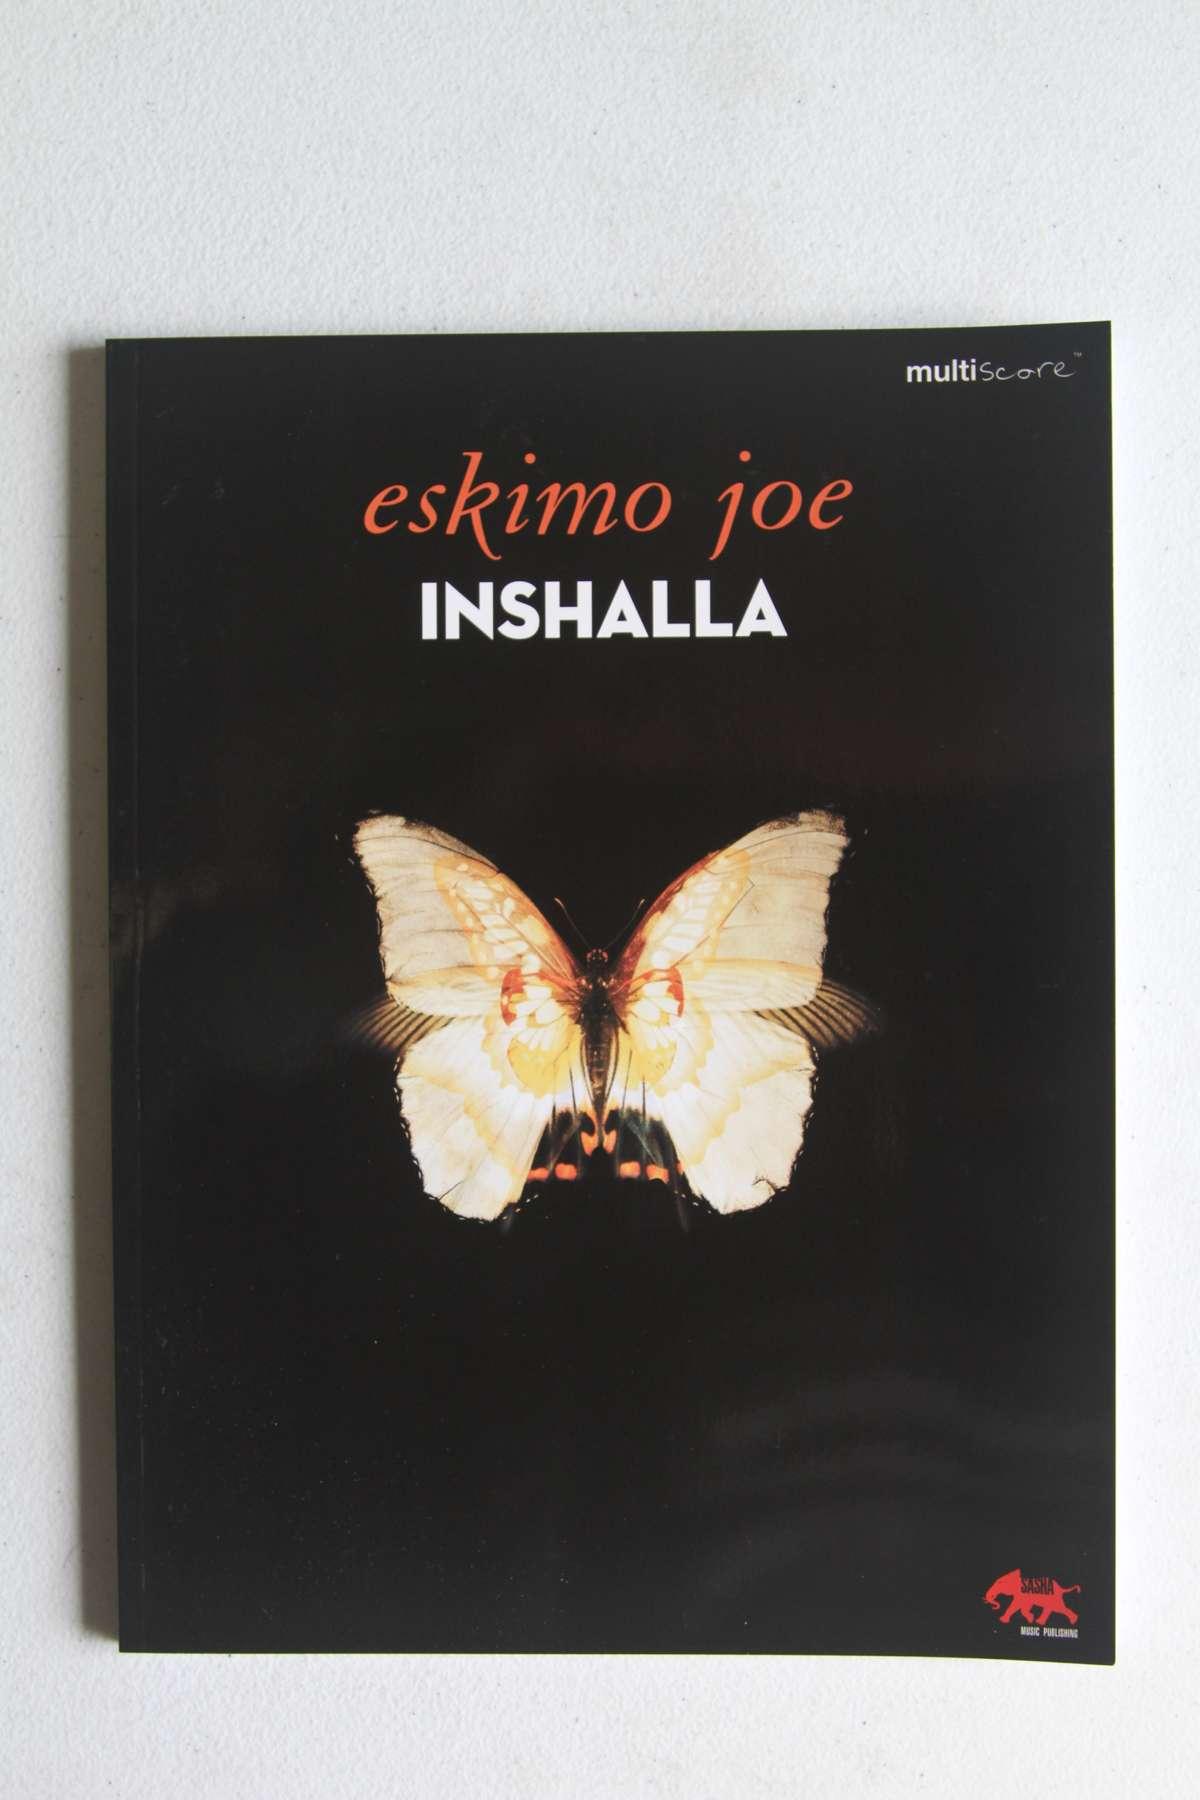 Inshalla - Songbook - Eskimo Joe